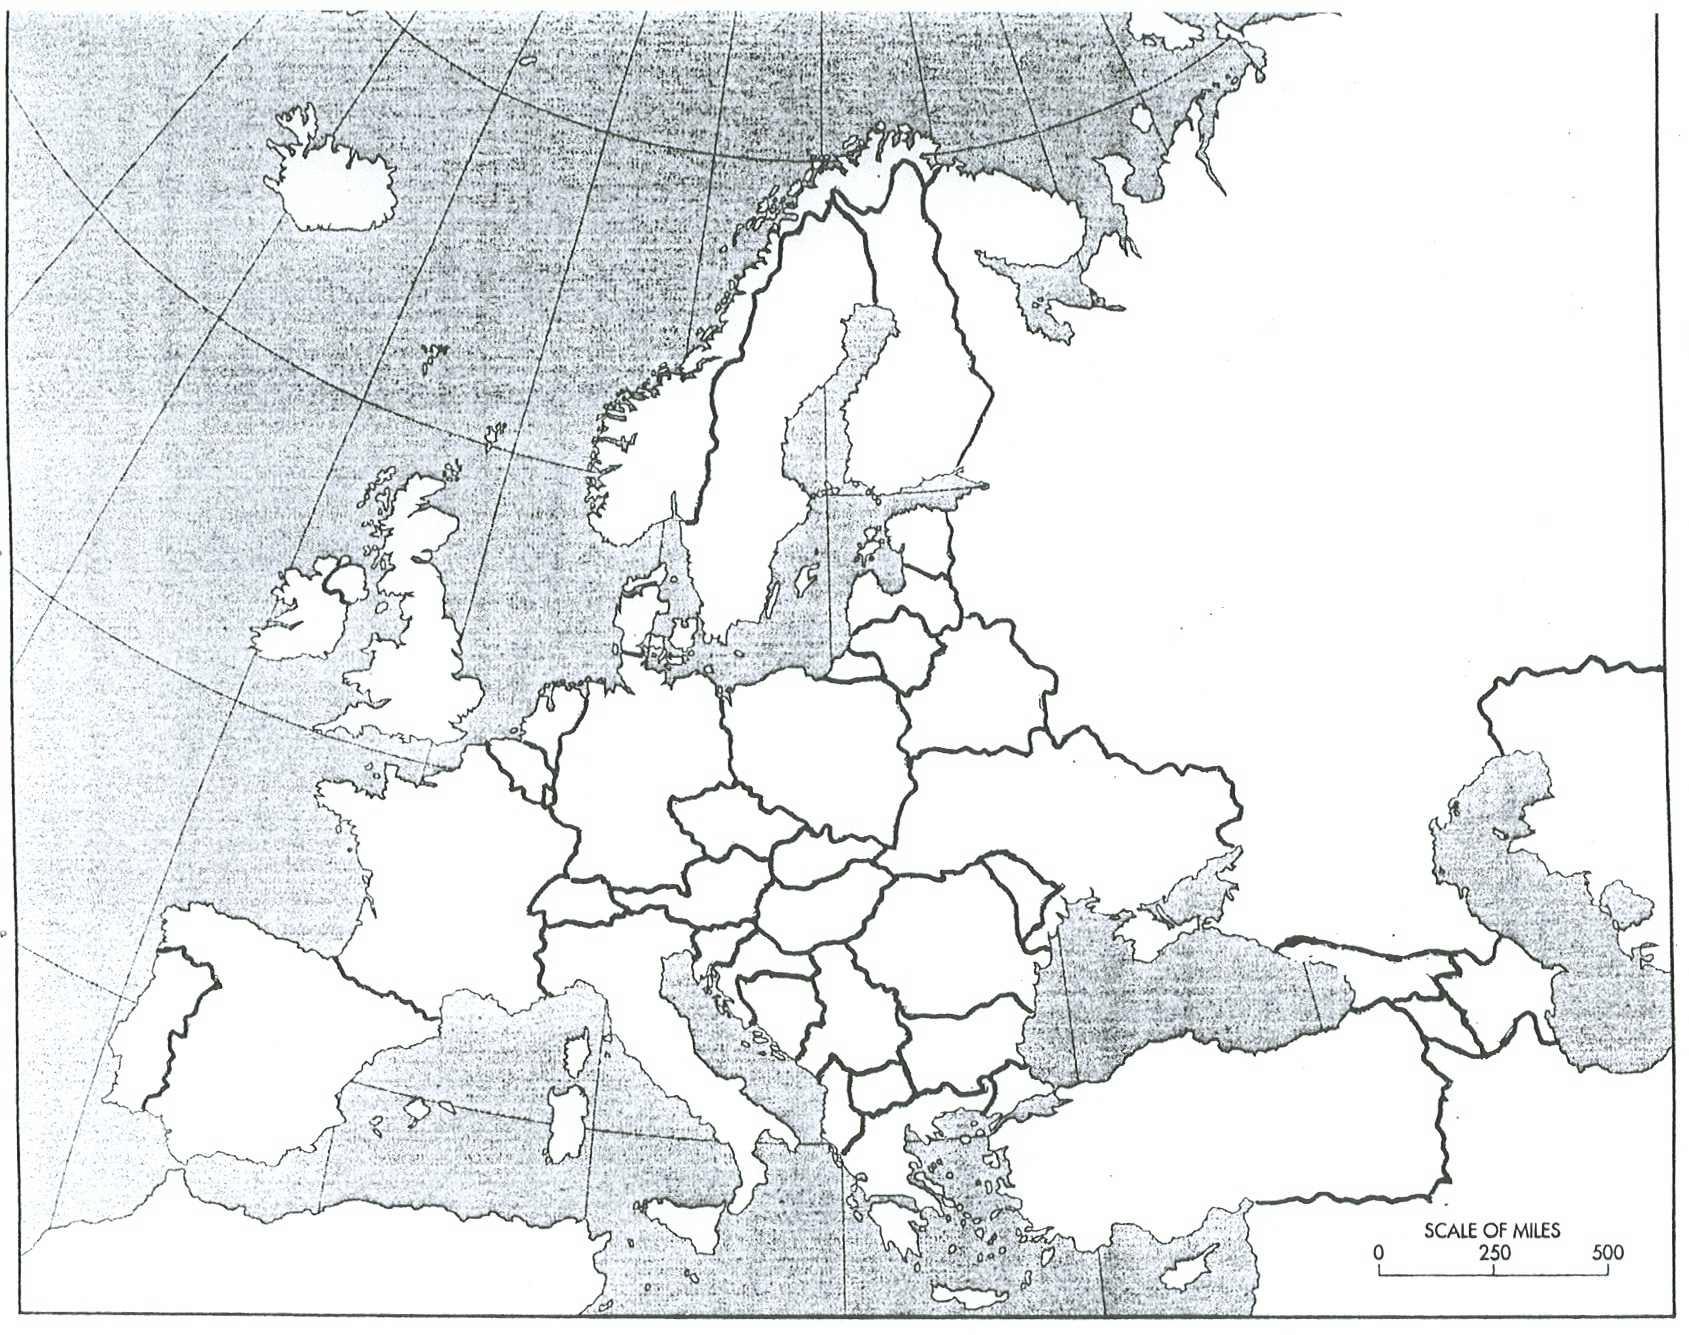 Paling Inspiratif Map Of Europe Before Ww1 Blank